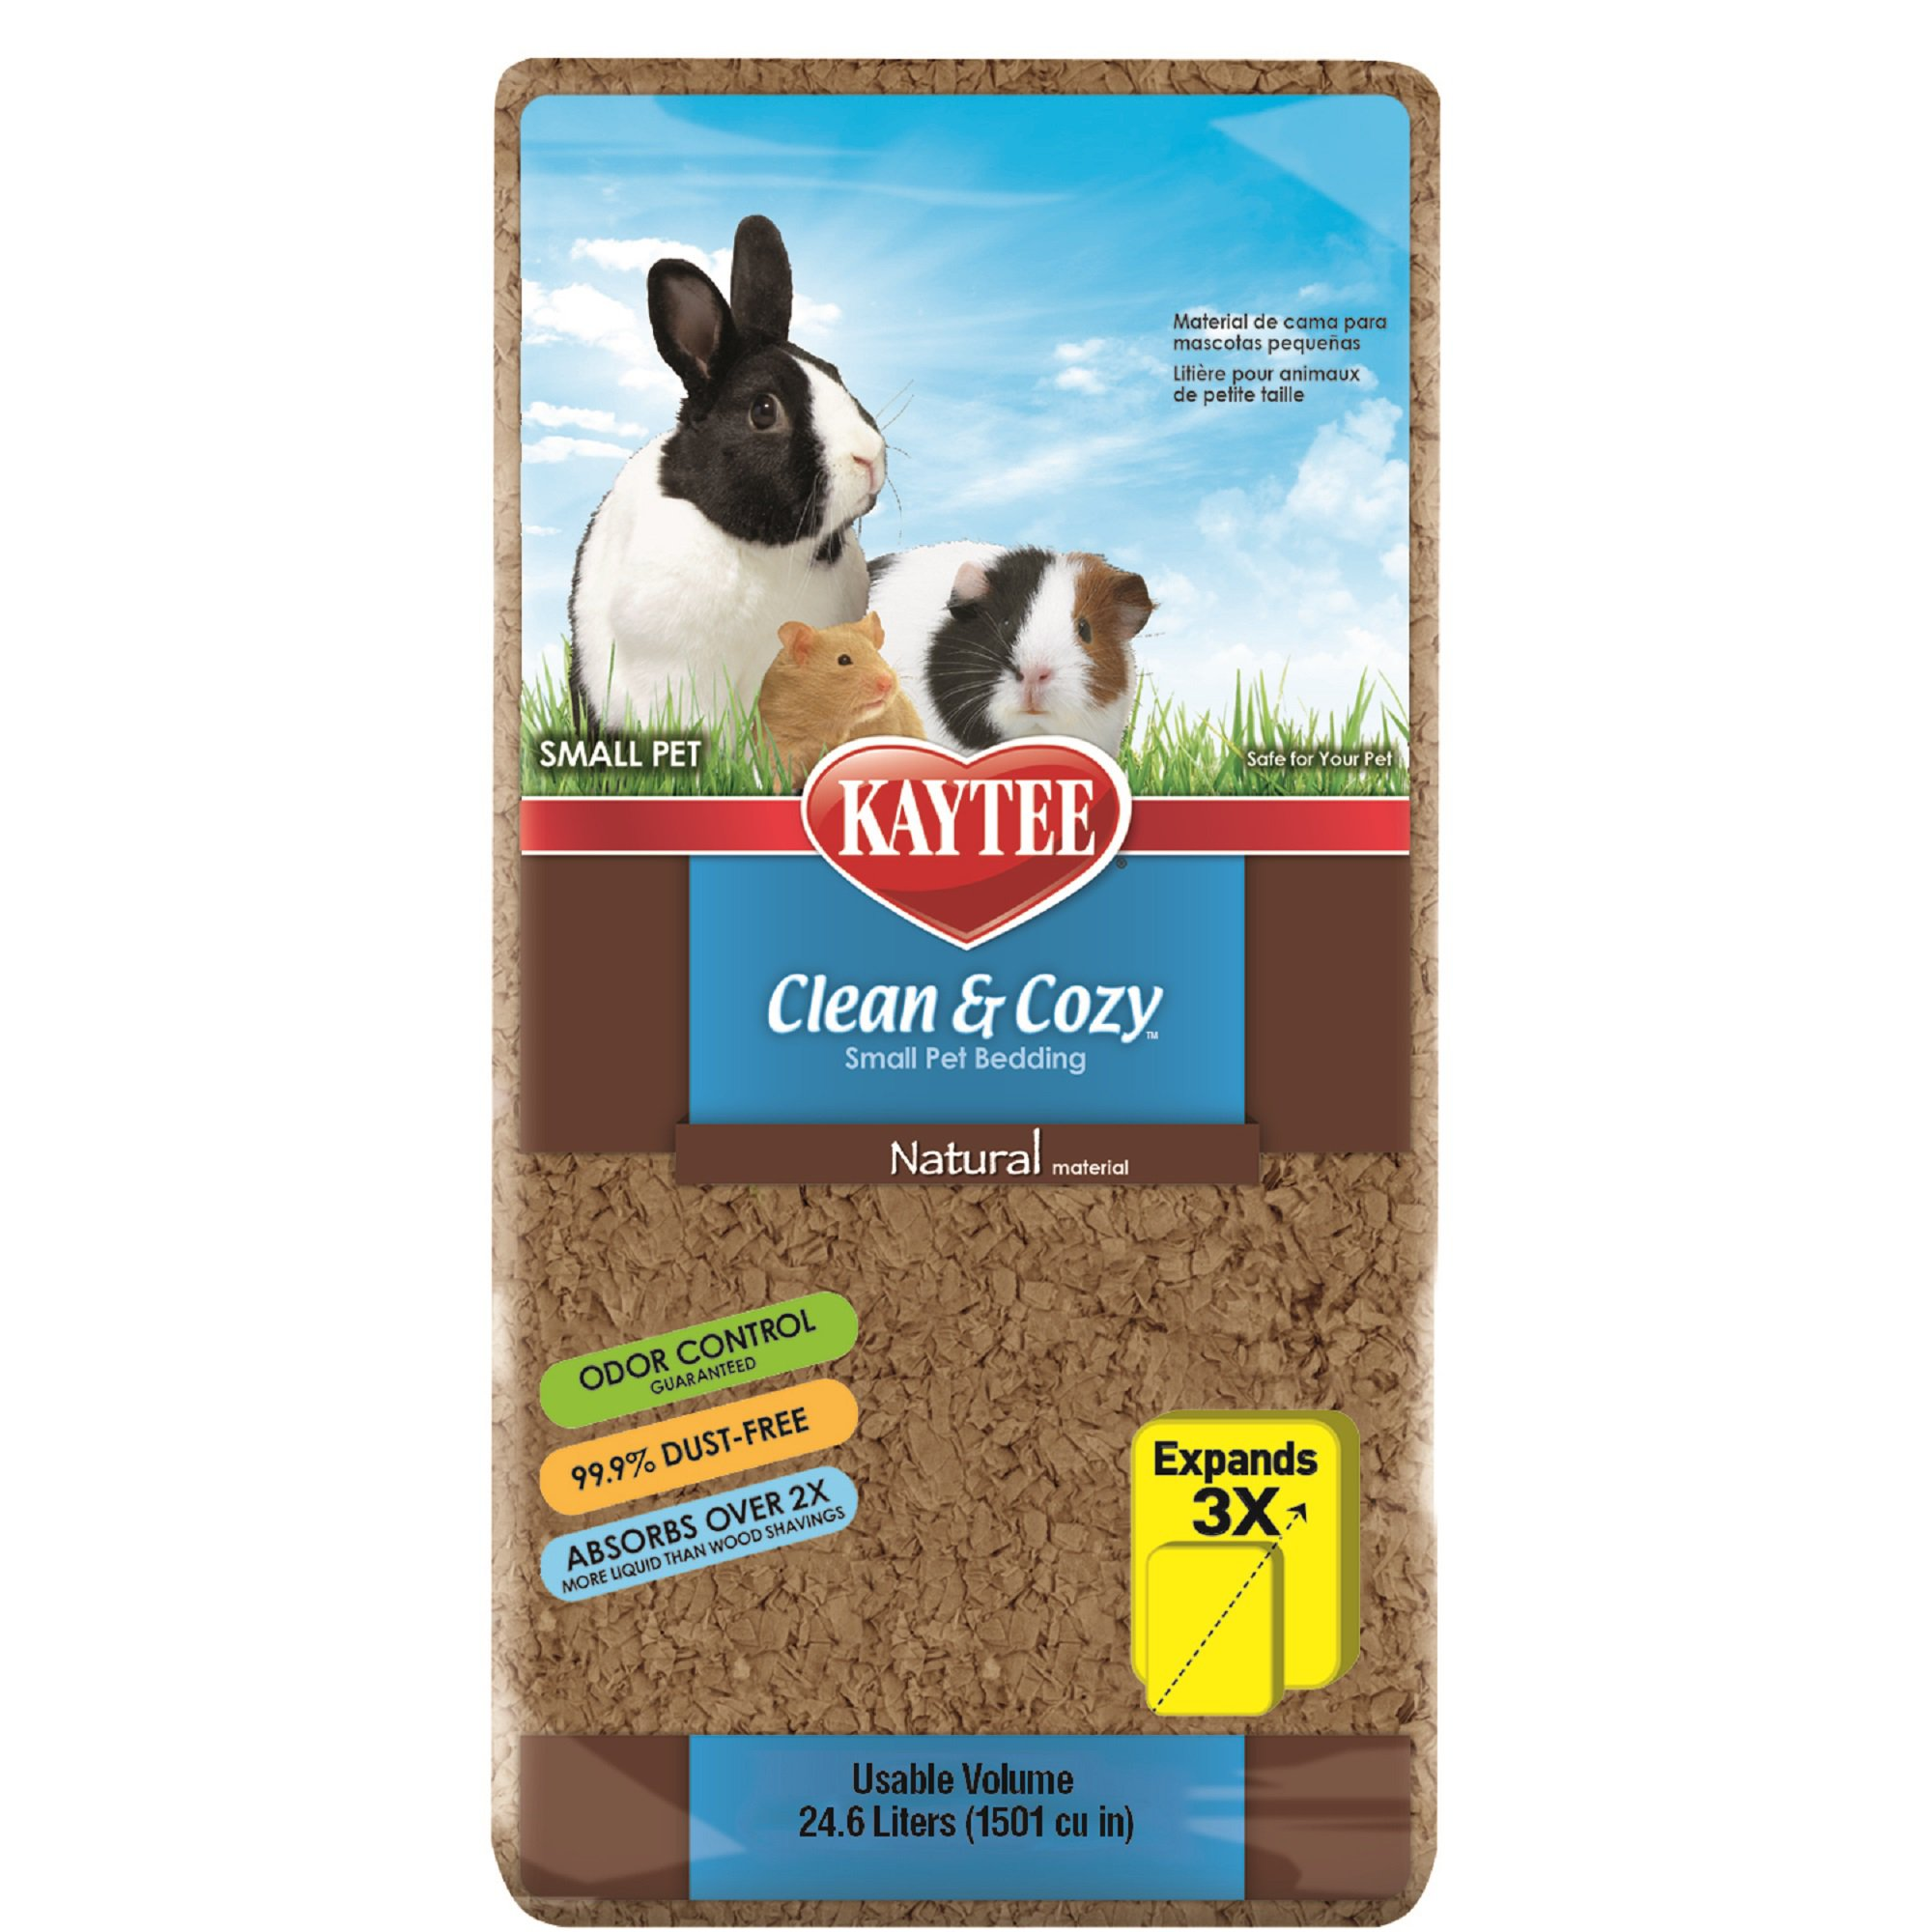 kaytee clean & cozy natural small animal bedding | petco